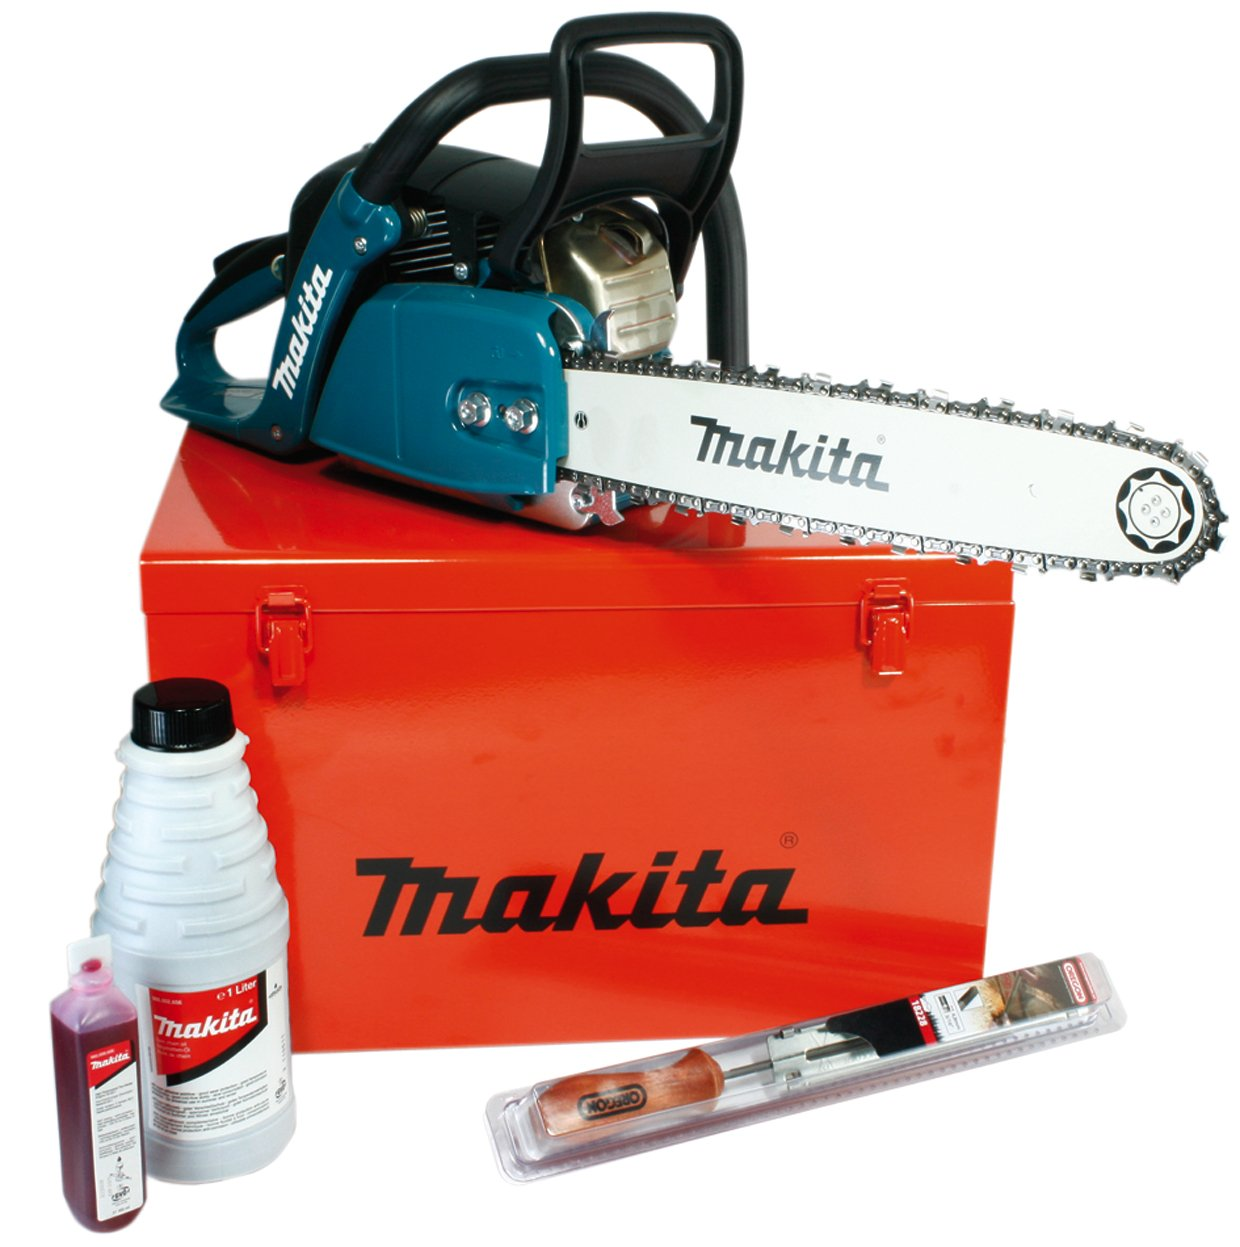 Makita ea4300/F38/x Tron/çonneuse /à essence 38/cm